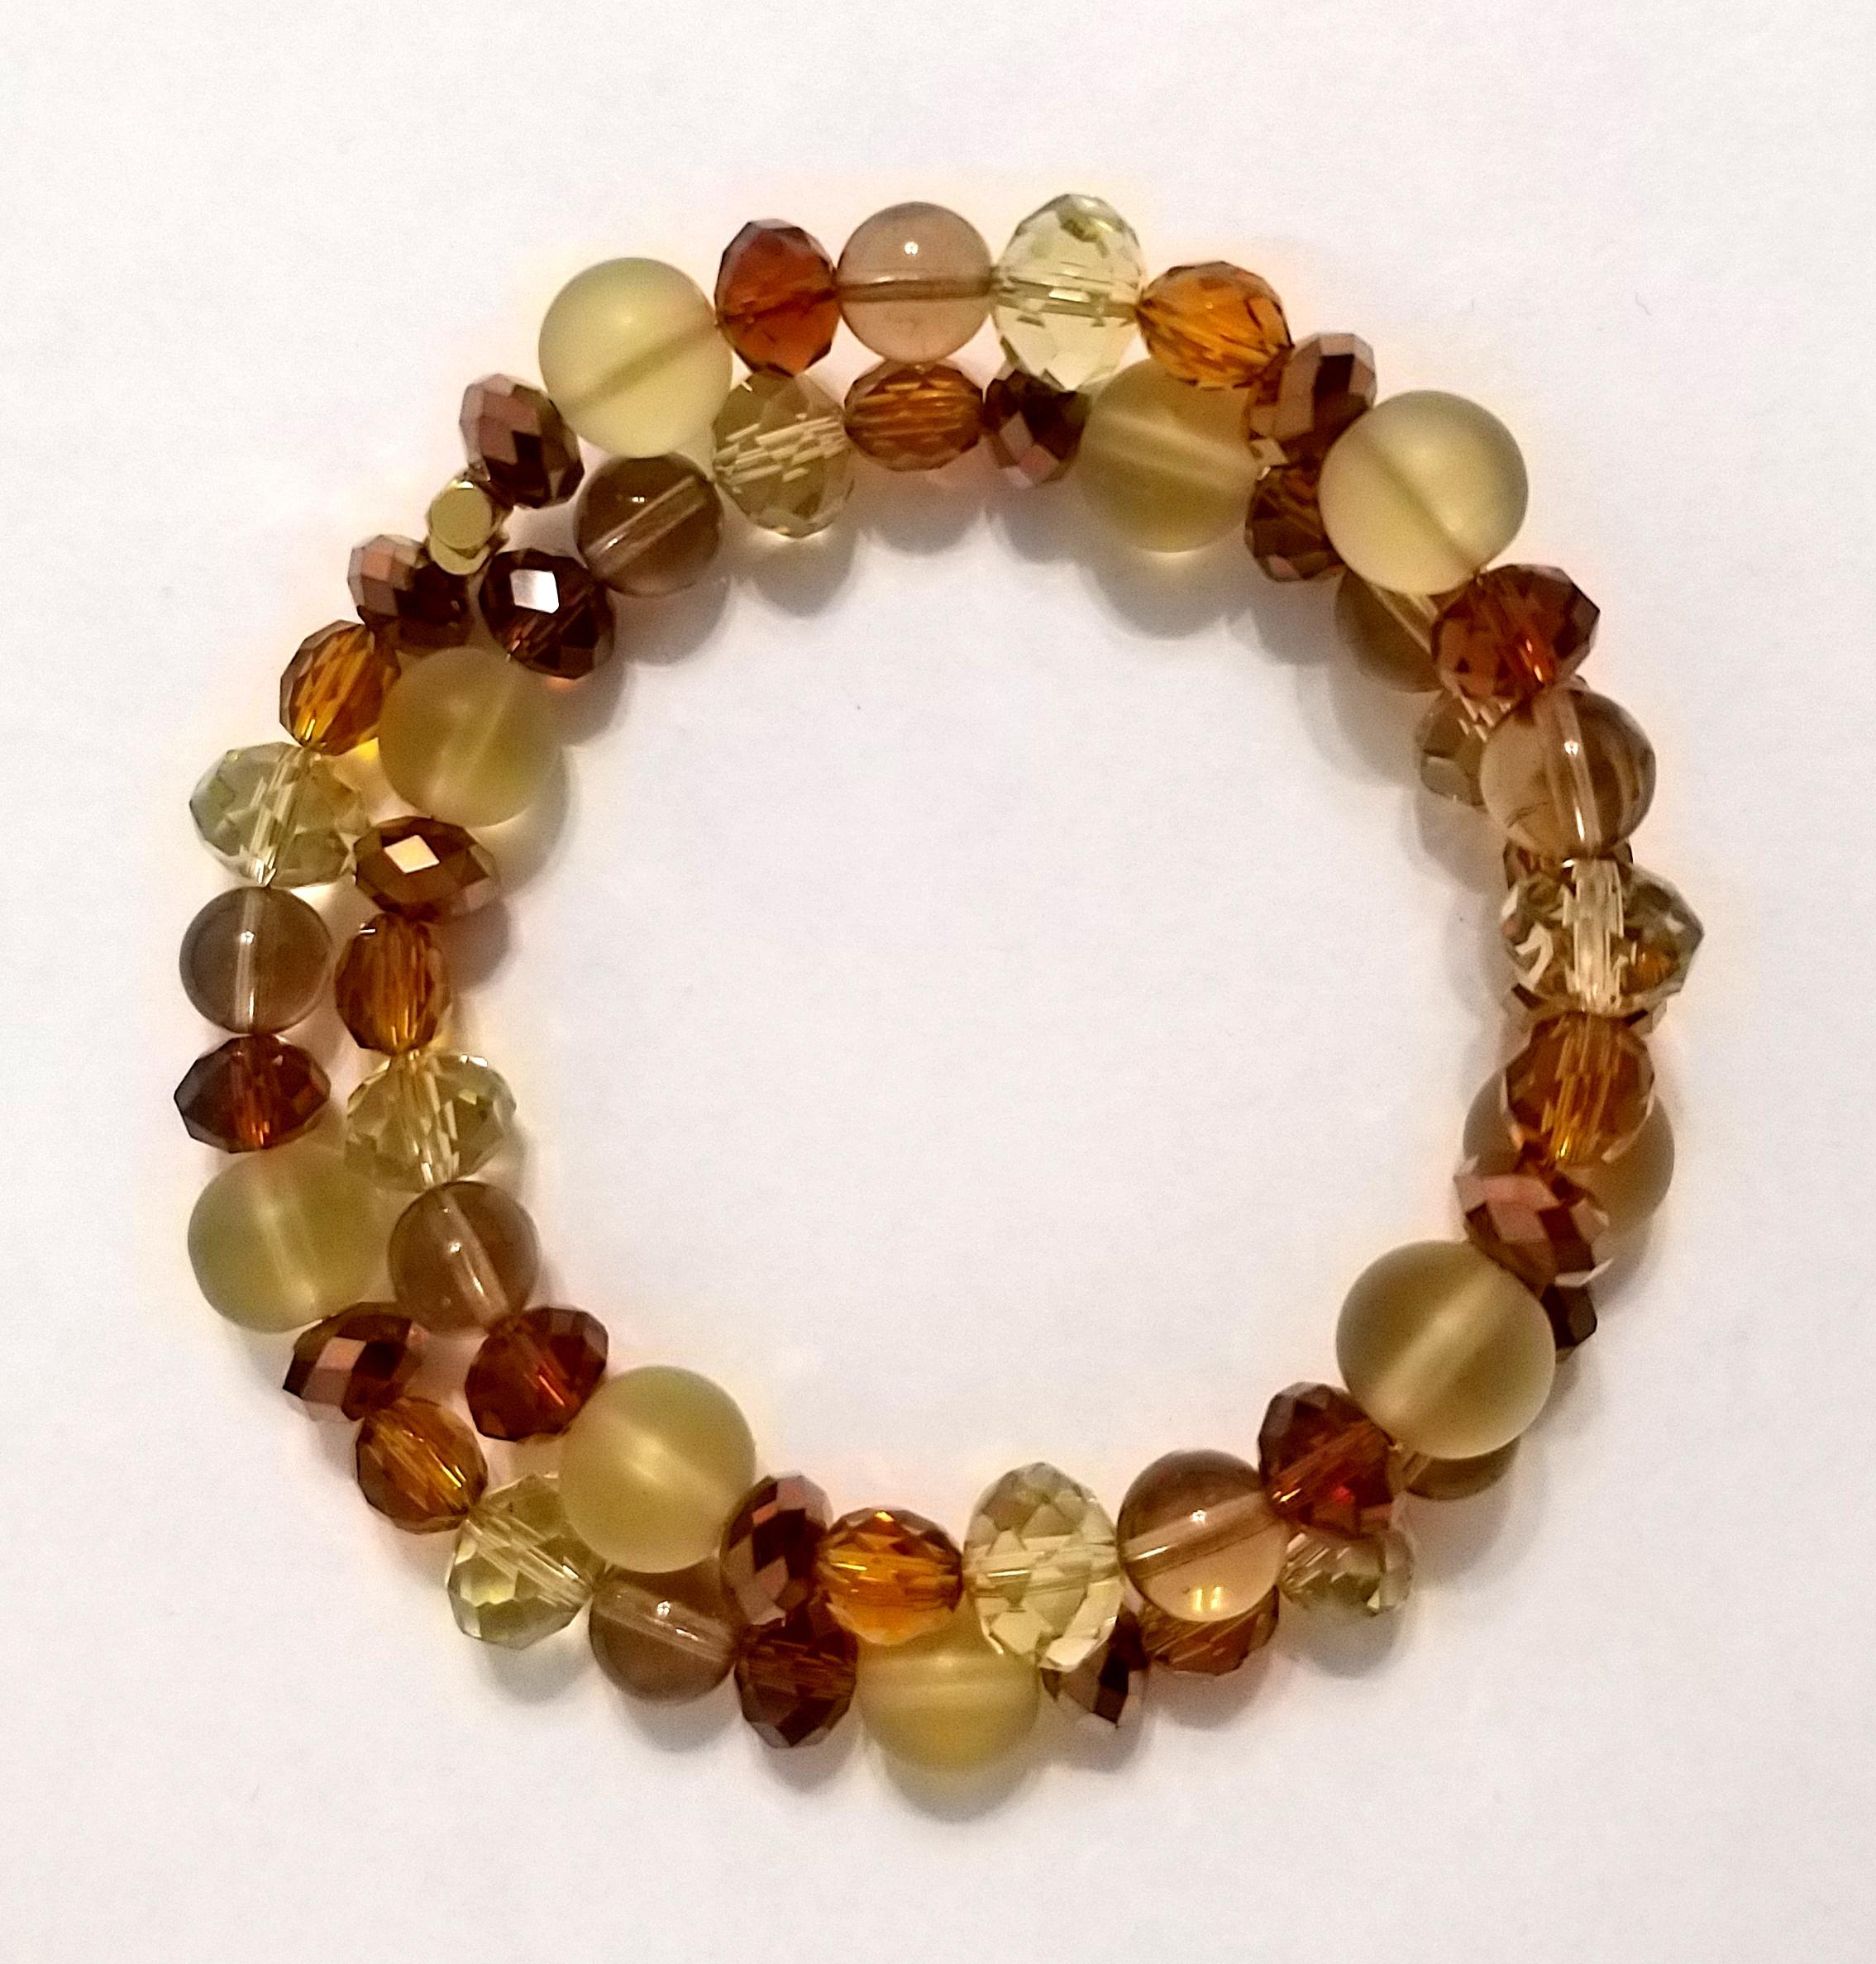 #FP-B 190821 bracelet  suggested $22 usd